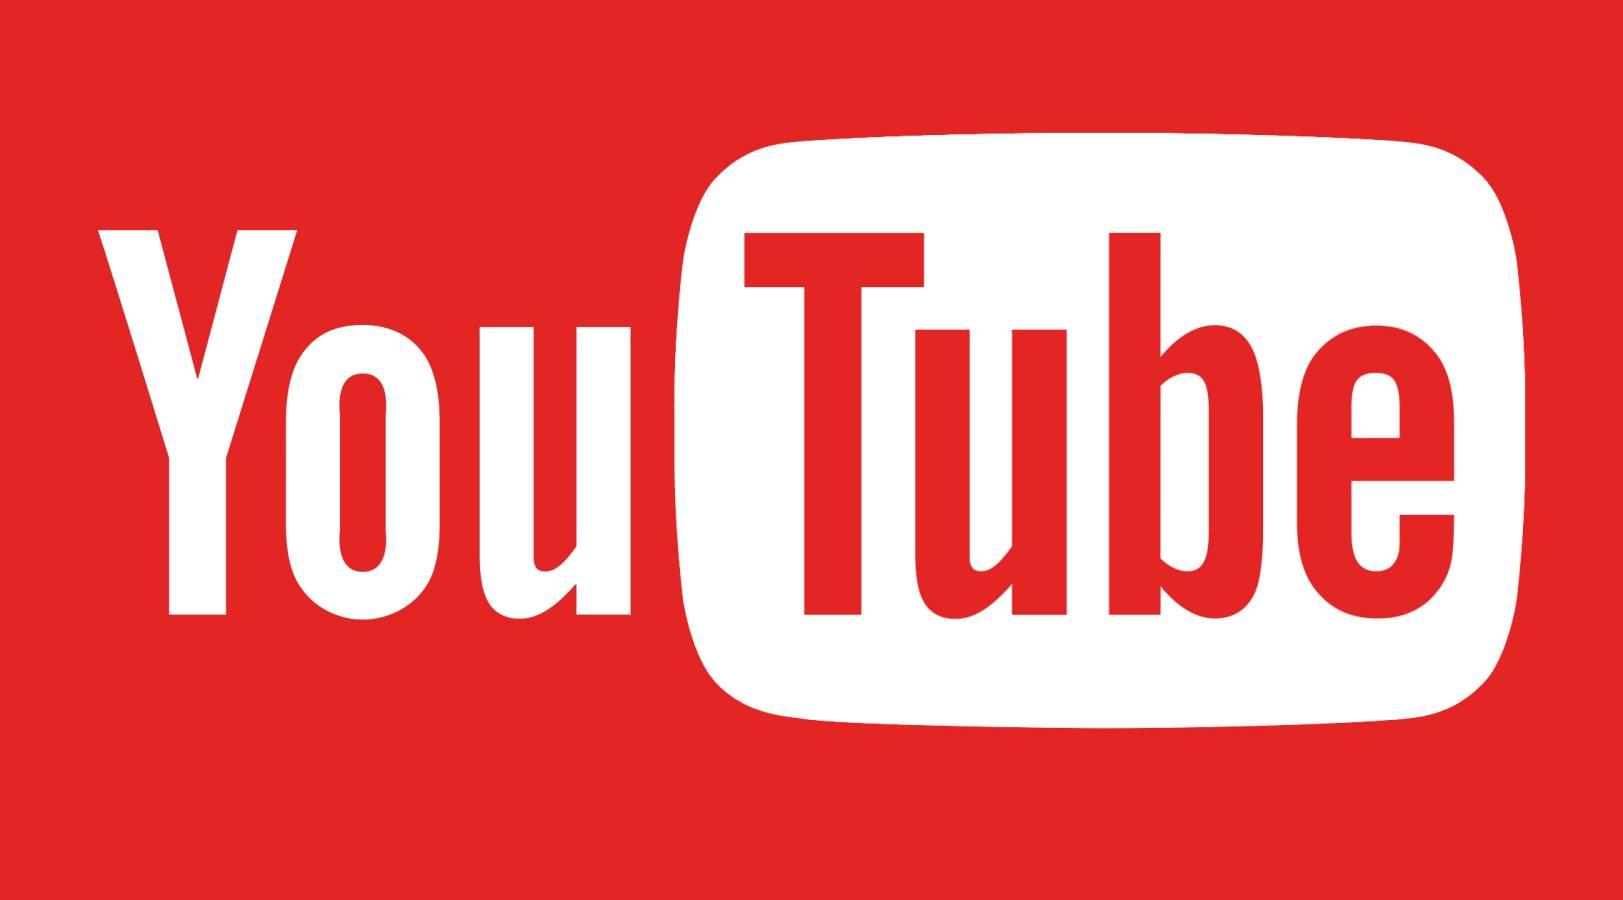 YouTube Actualizarea Noua Lansata pentru Utilizatori Astazi